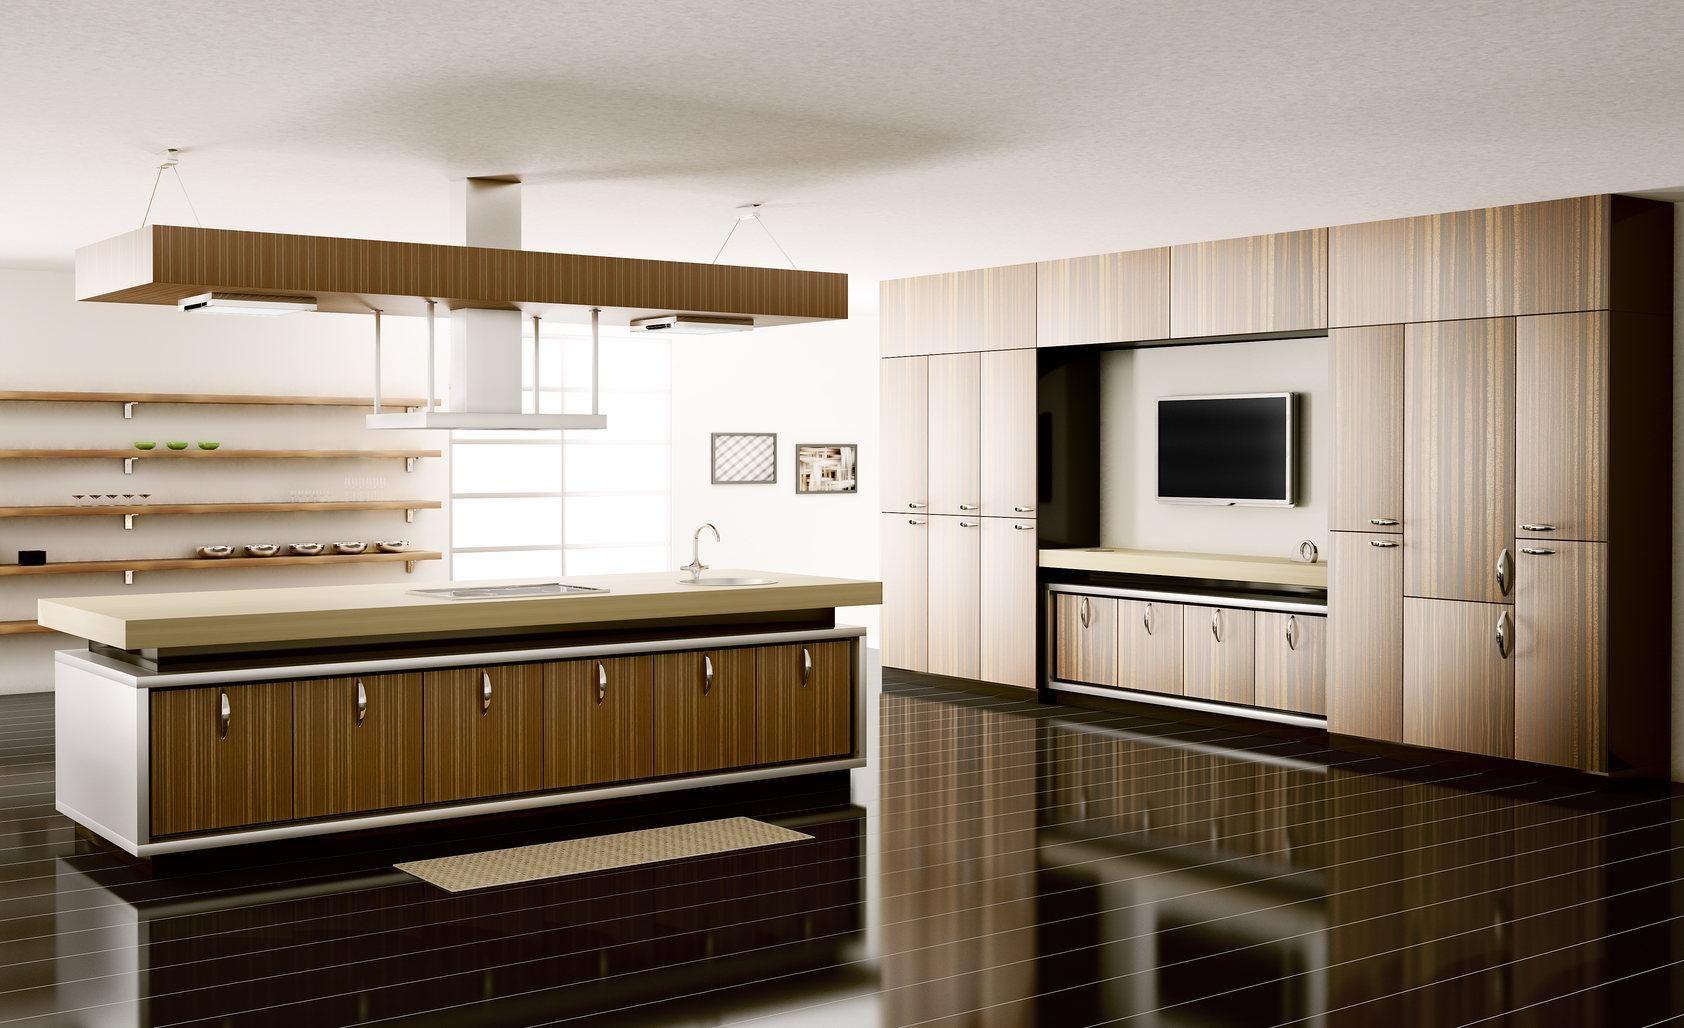 Passaic Nj Cabinetry Contractor Passaic Nj Cabinetry Contractor Custom Cabinet Refinishing